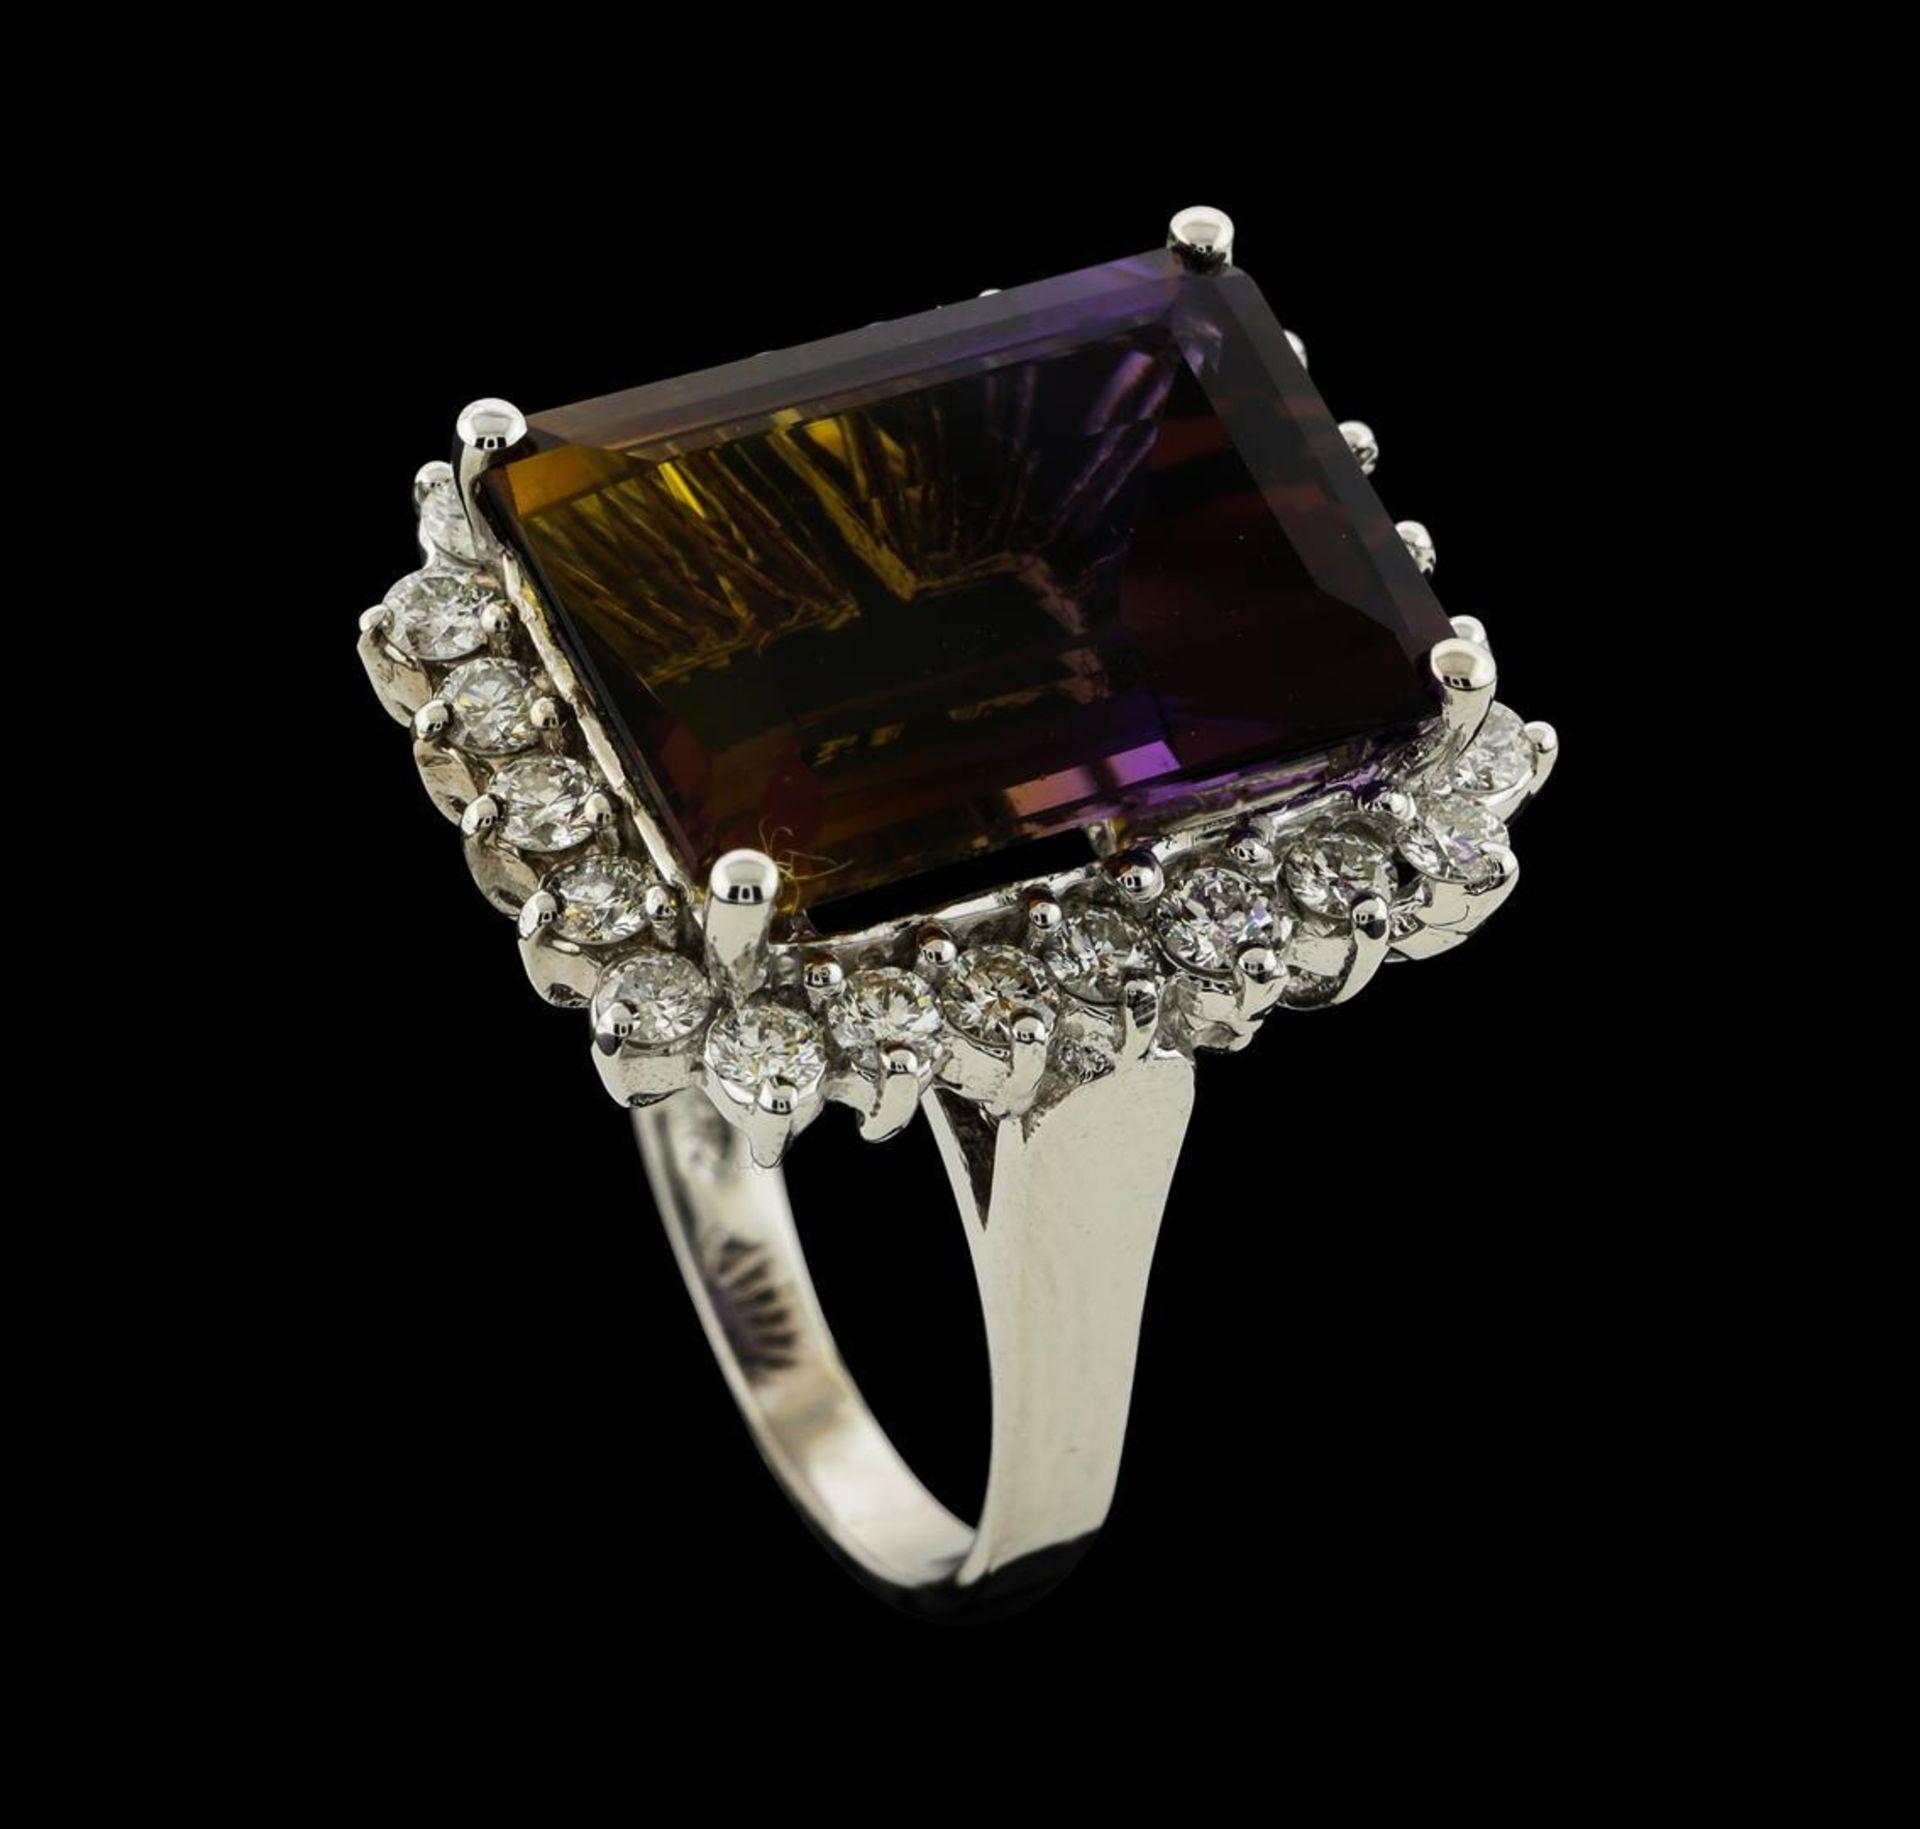 11.78 ctw Ametrine Quartz and Diamond Ring - 14KT White Gold - Image 4 of 5